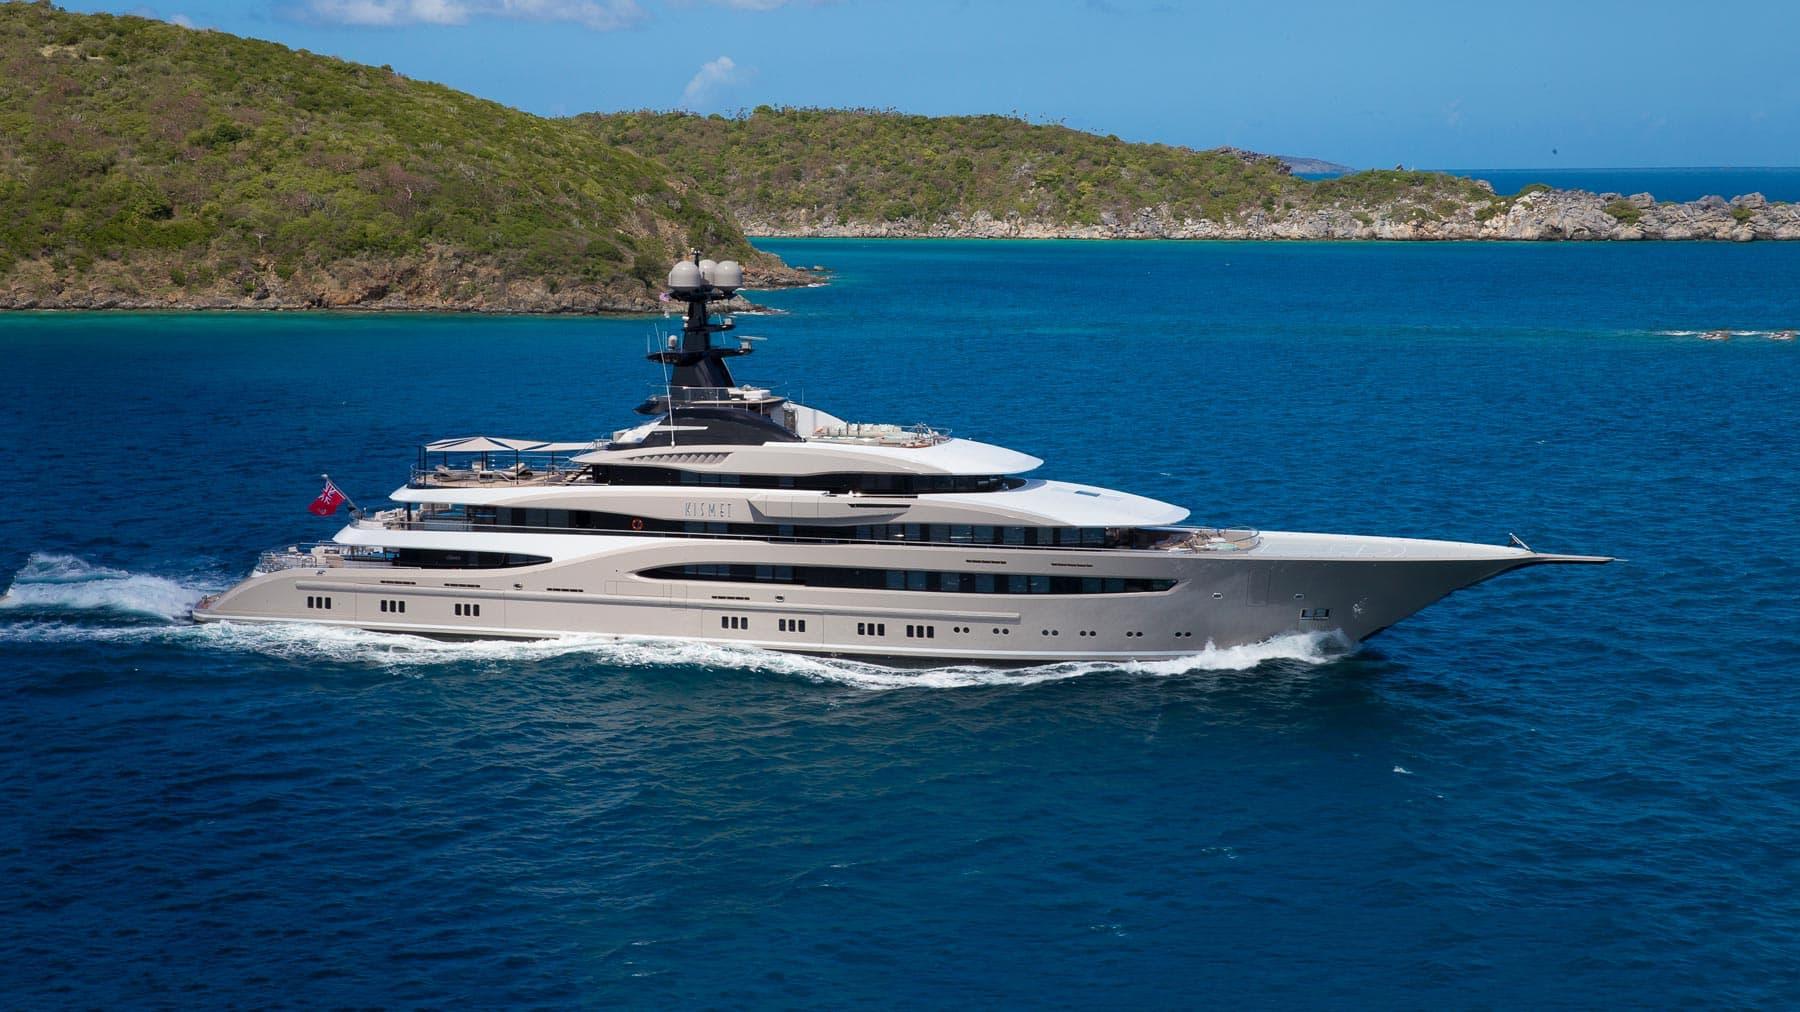 Lurssen Yacht KISMET Profile